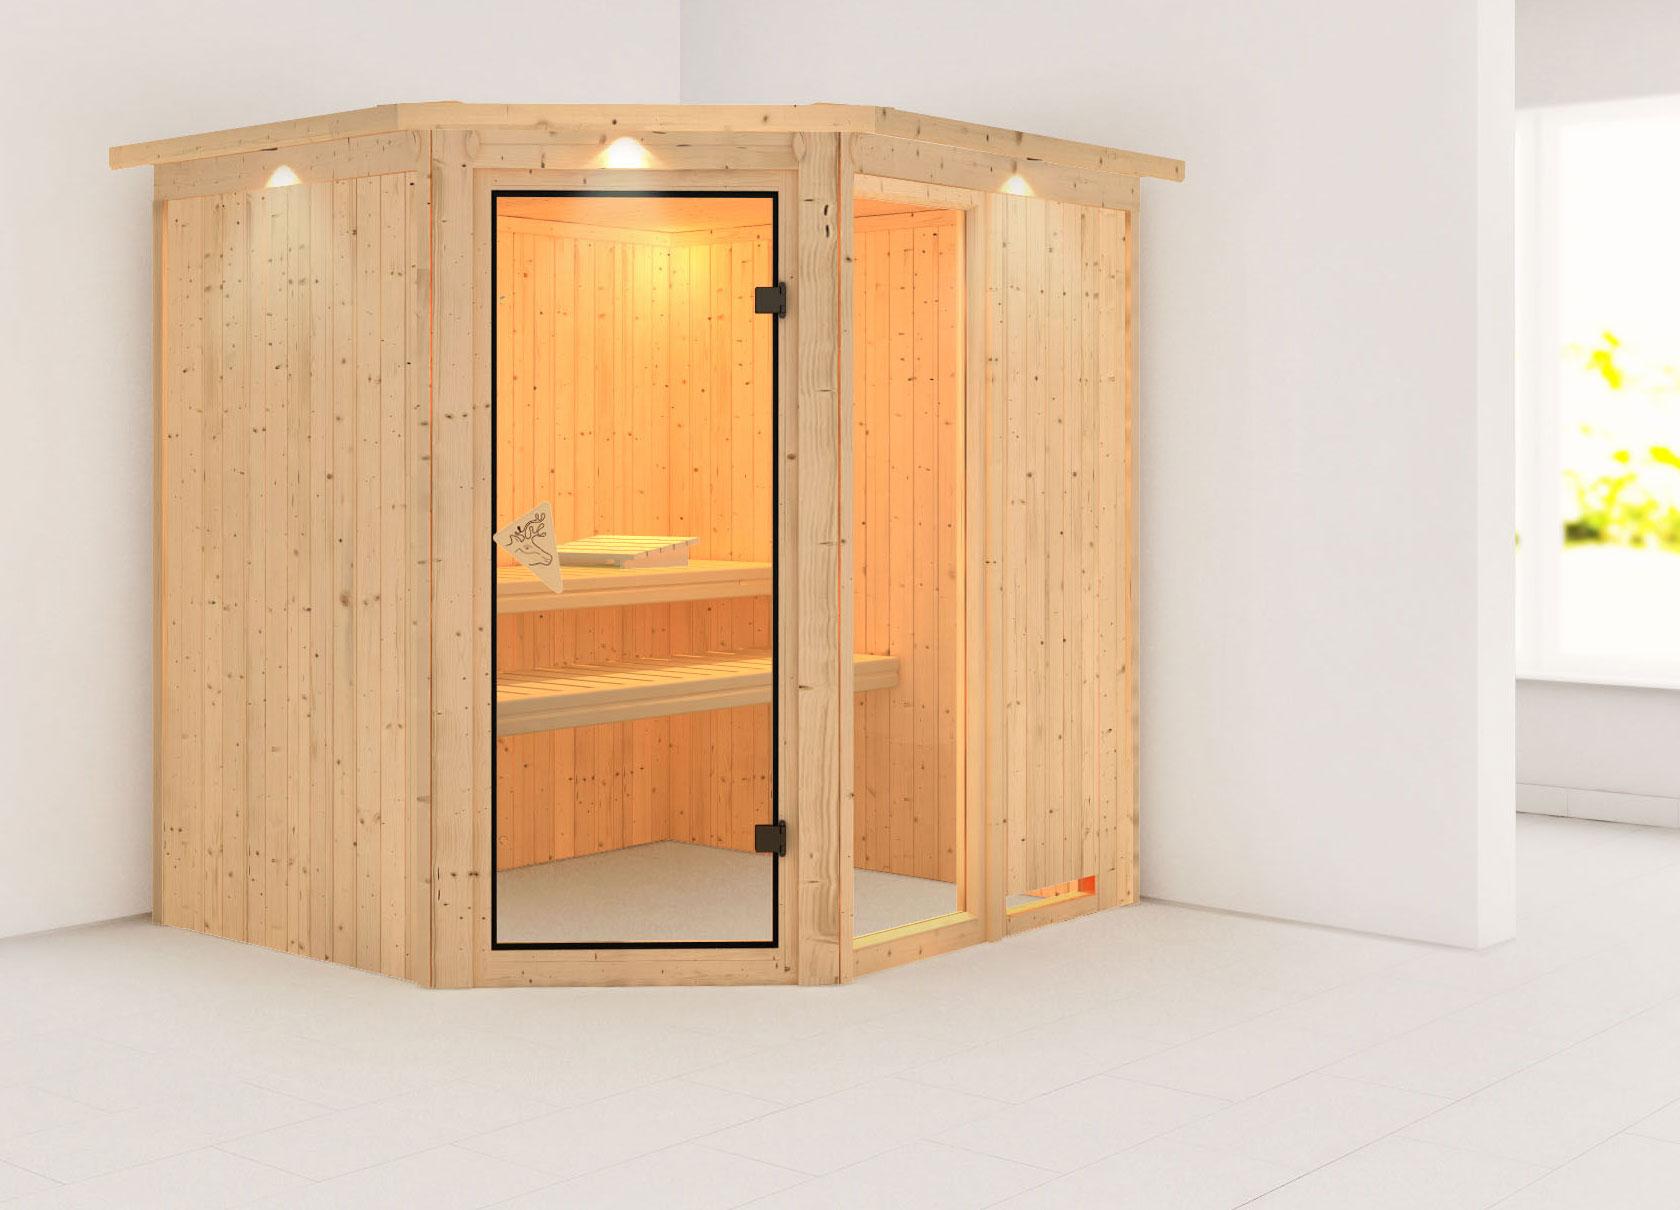 karibu sauna fiona2 68mm dachkranz ohne ofen classic t r bei. Black Bedroom Furniture Sets. Home Design Ideas